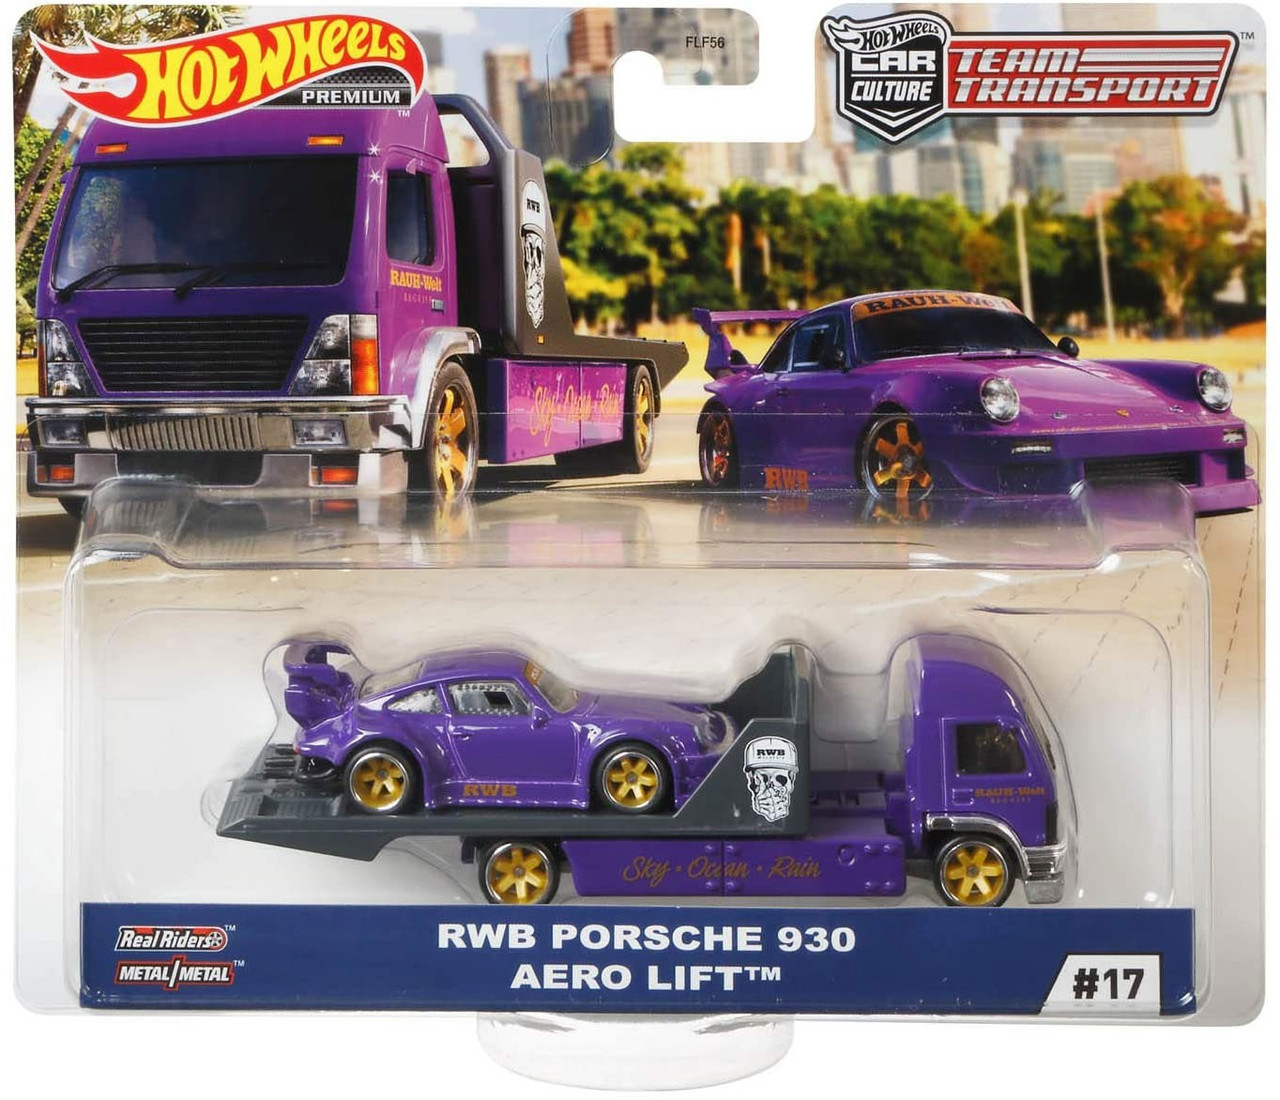 Toys Hobbies Hot Wheels 2020 Car Culture Team Transport Case J Corvette Vw Dodge Pre Order Thebarbers Ch